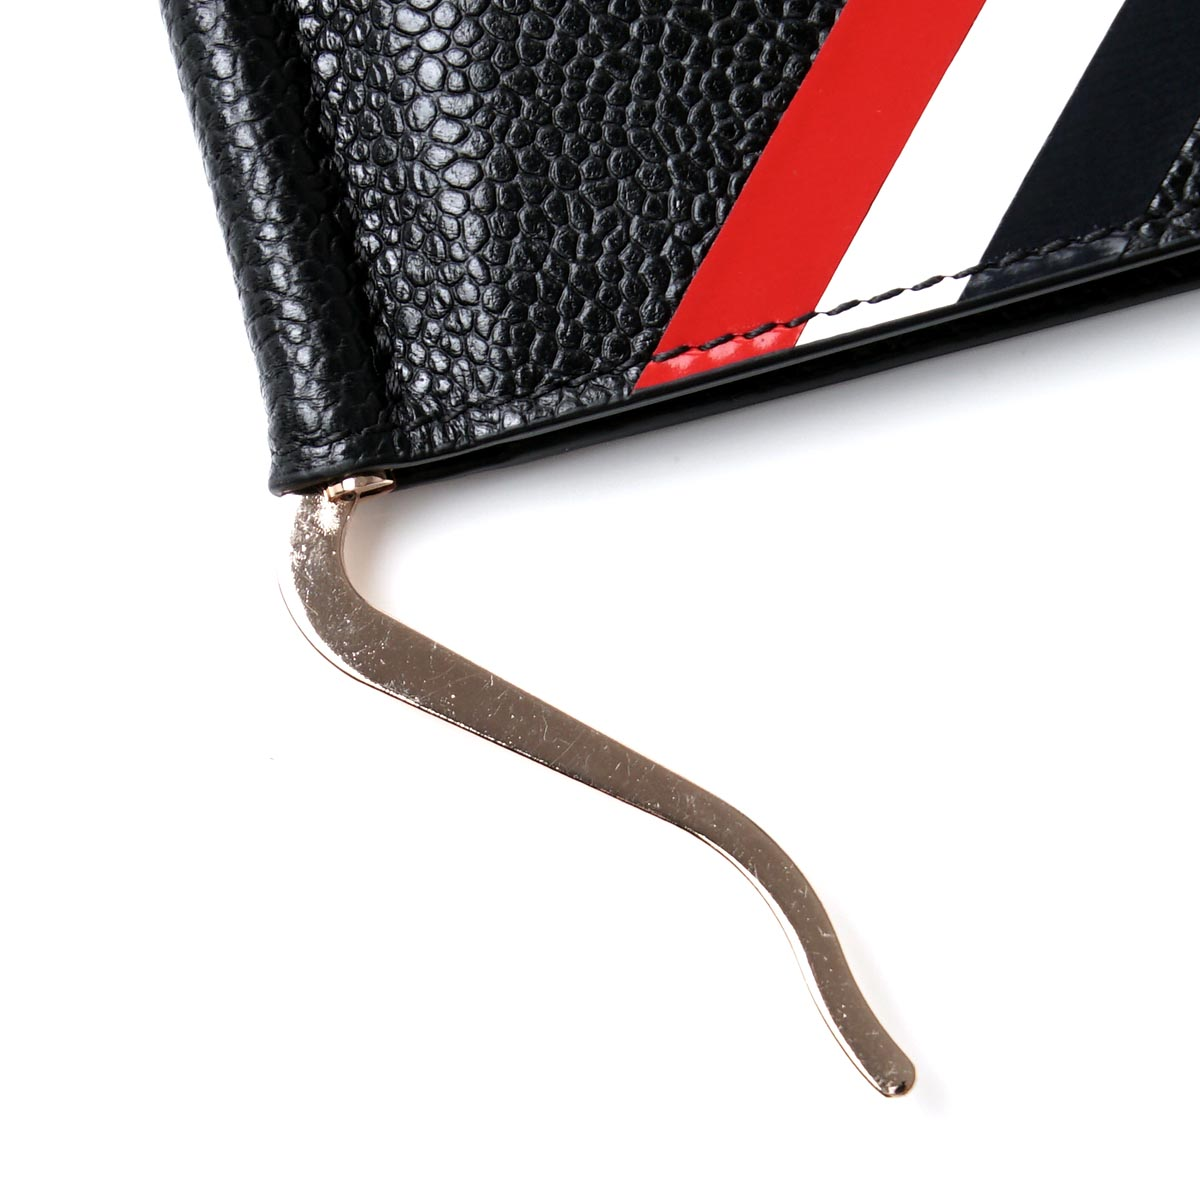 ff26e9d410 ... Tom Browne THOM BROWNE. Folio wallet money clip black men leather gift  present maw042a 00198